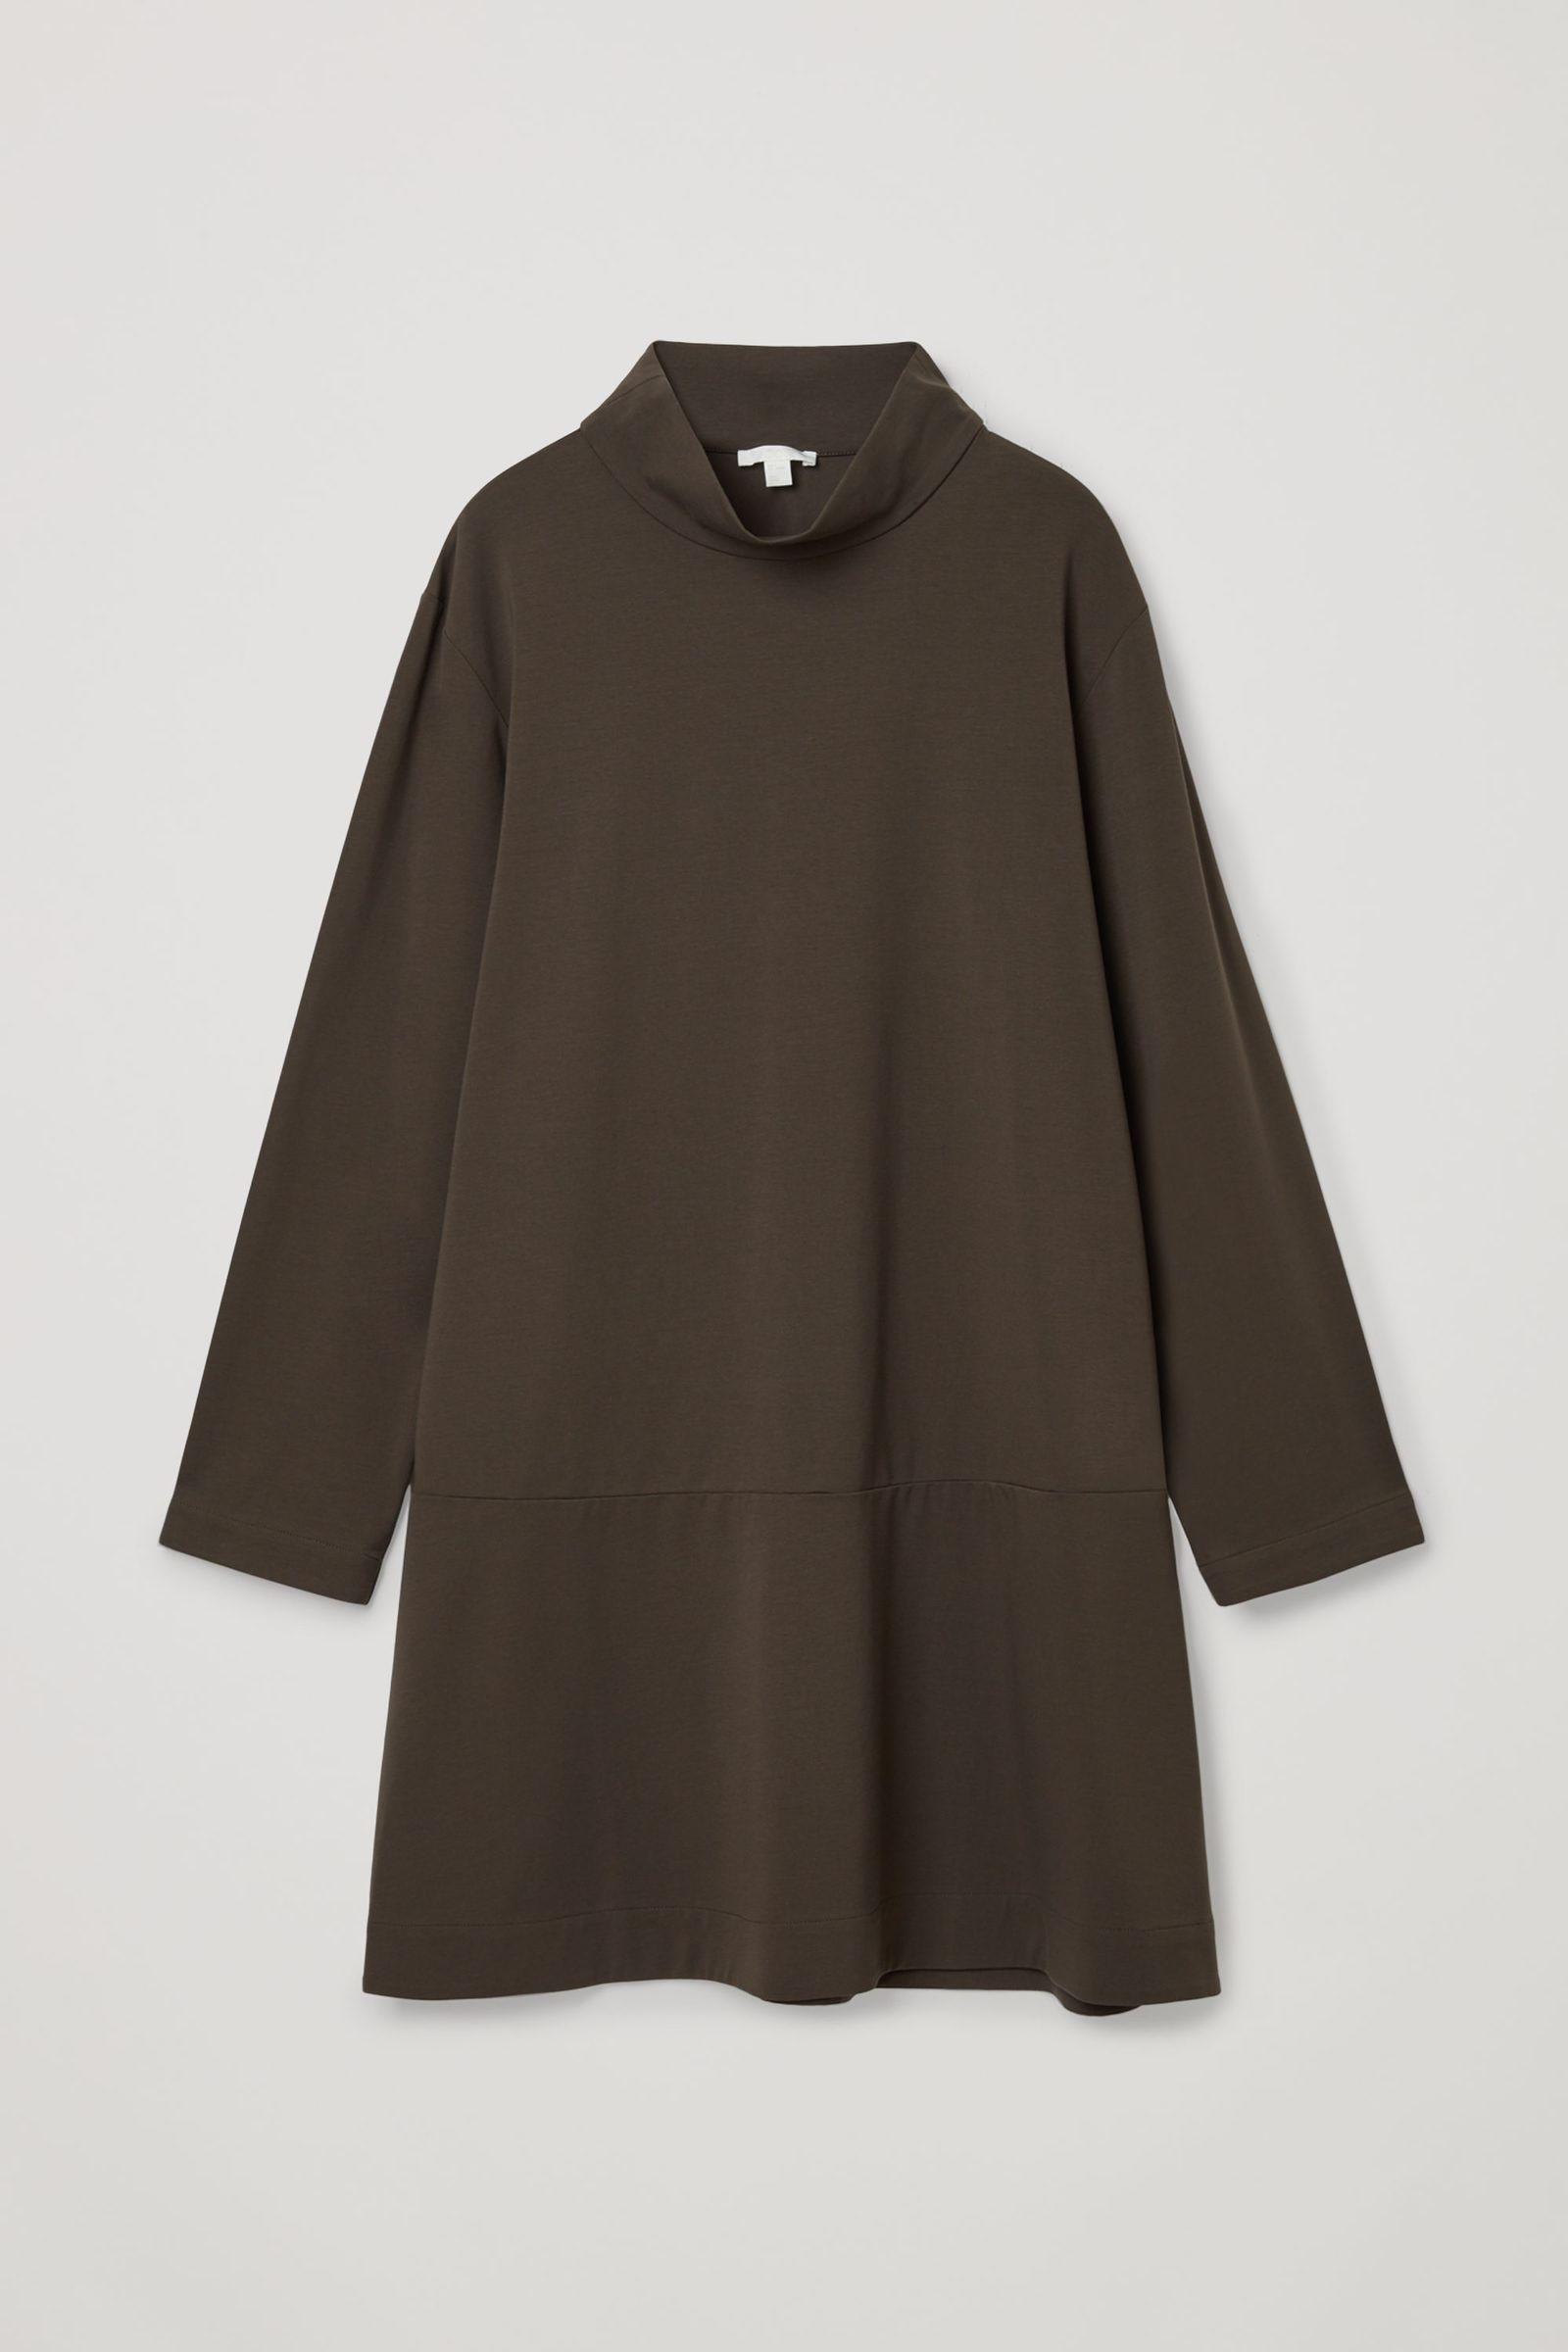 COS 코튼 하이 넥 드레스의 브라운컬러 Product입니다.